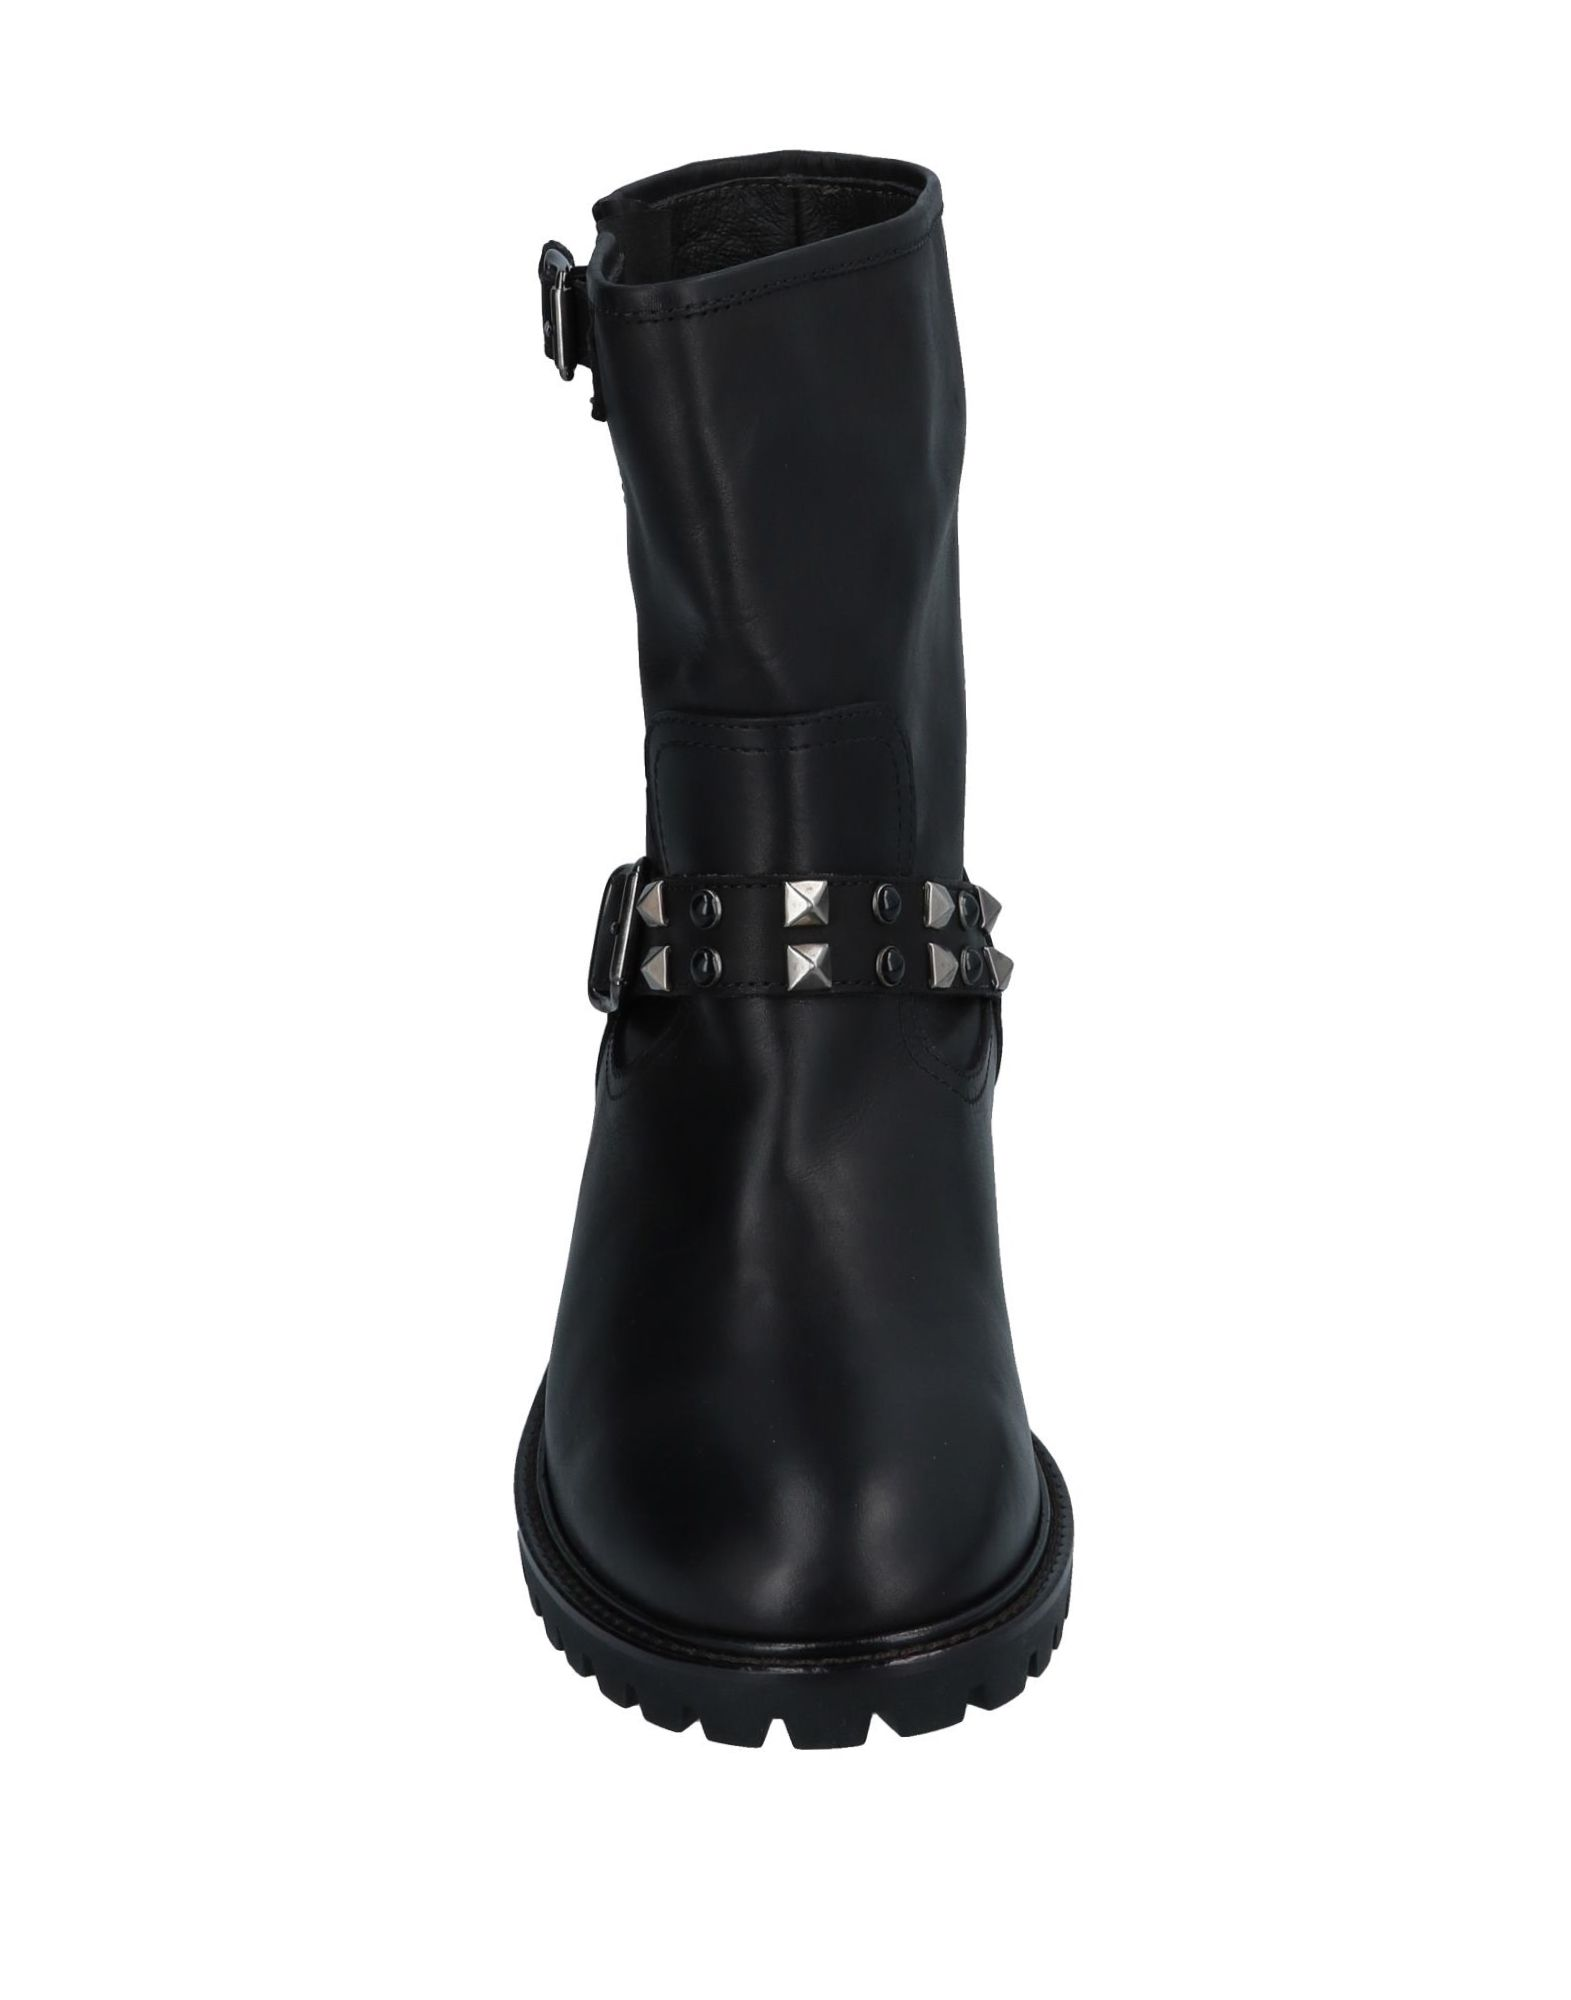 Via Roma 15 Stiefelette Damen Schuhe  11560928GKGut aussehende strapazierfähige Schuhe Damen 602d63